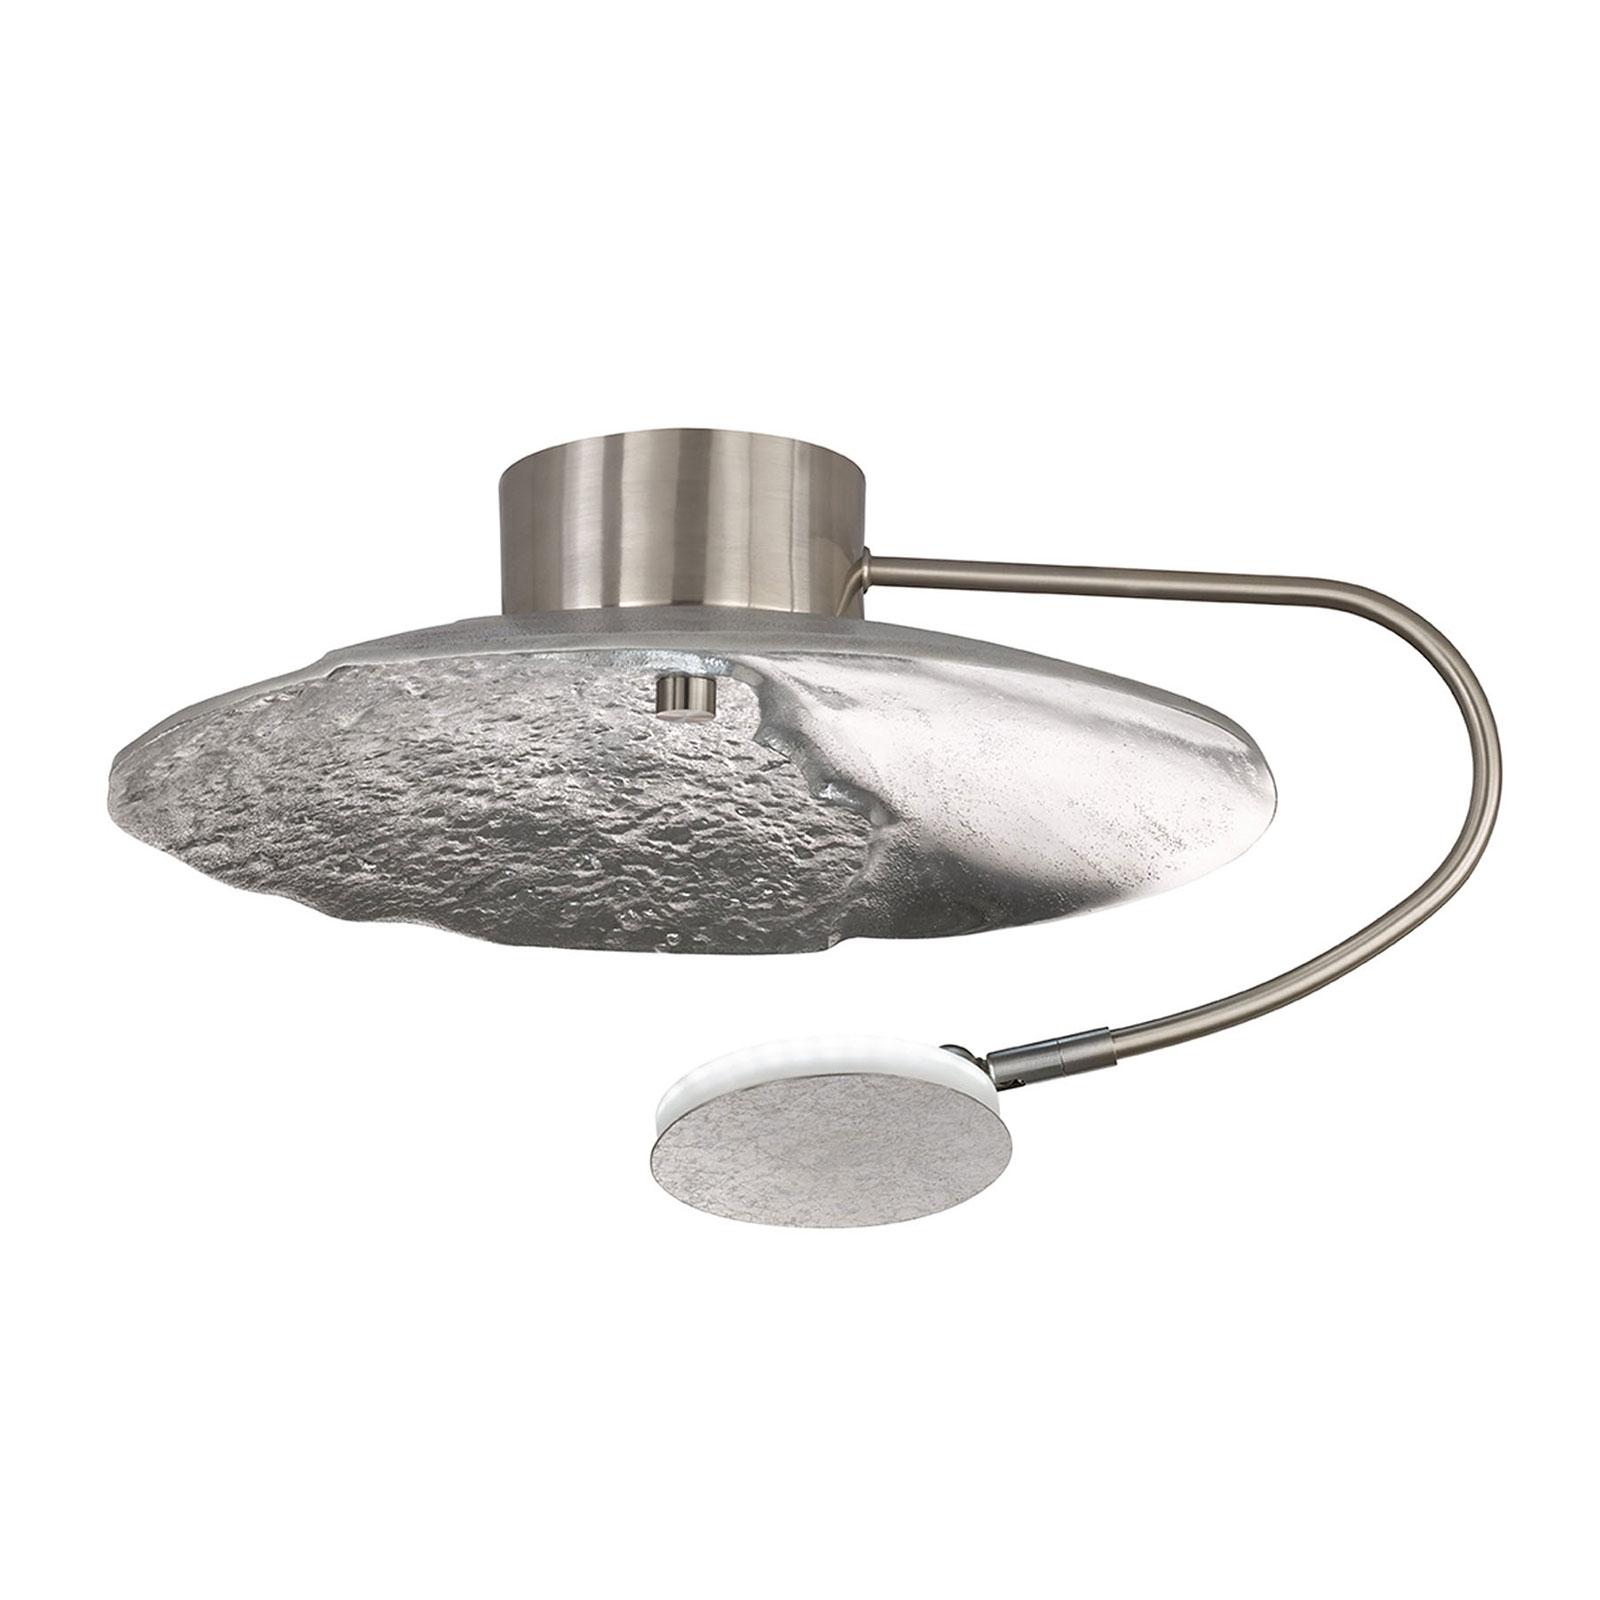 Lampa sufitowa LED Rennes z pilotem, Ø 38cm